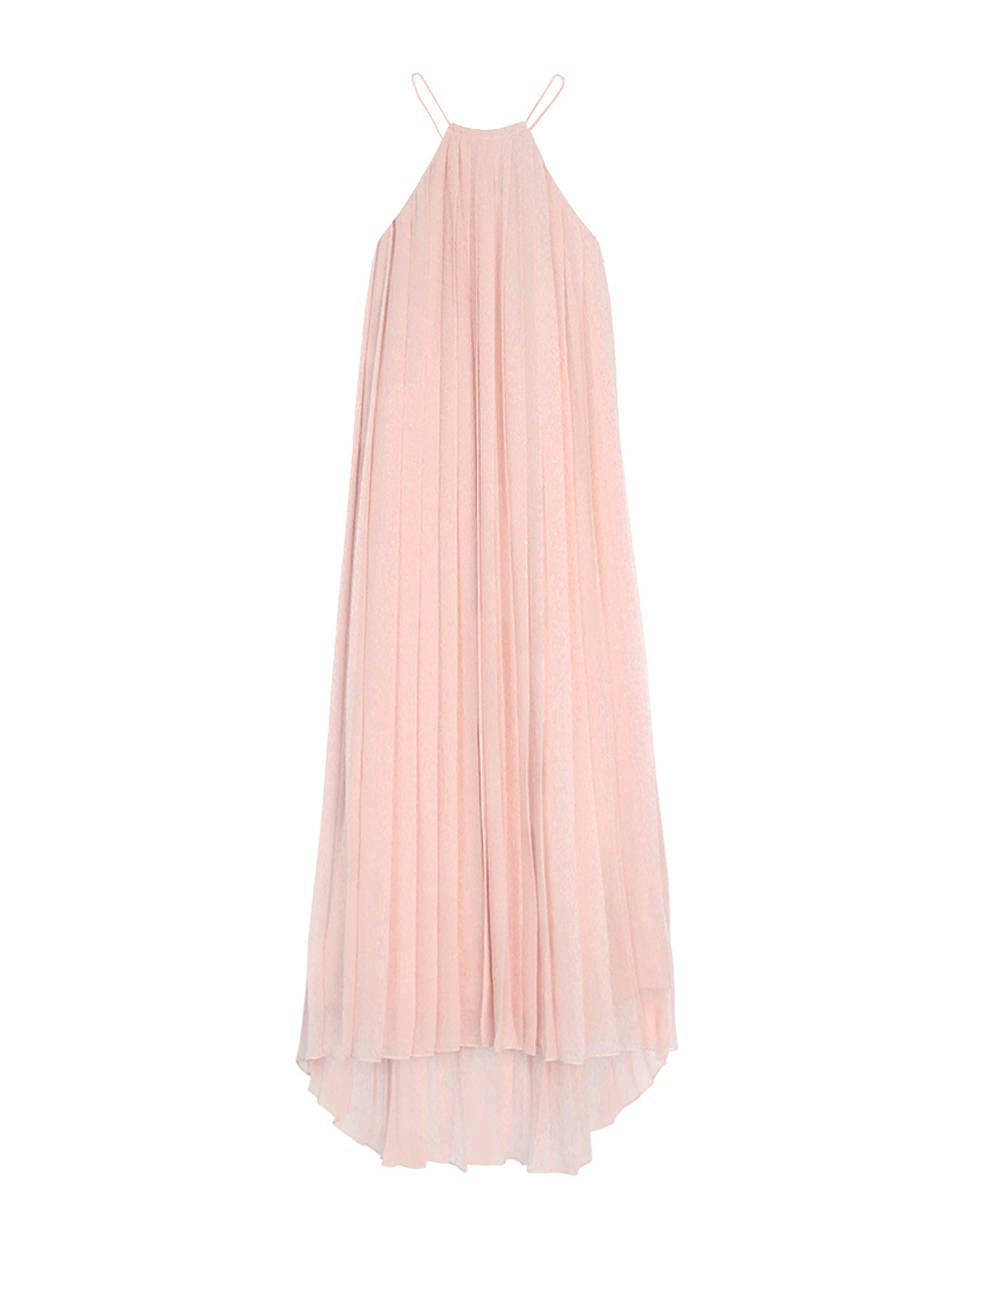 Tibi silk chiffon halter dress. We love this modern silk pleated halter  dress in the faintest shade of blush. Flowy and ultra feminine. 5a060aade